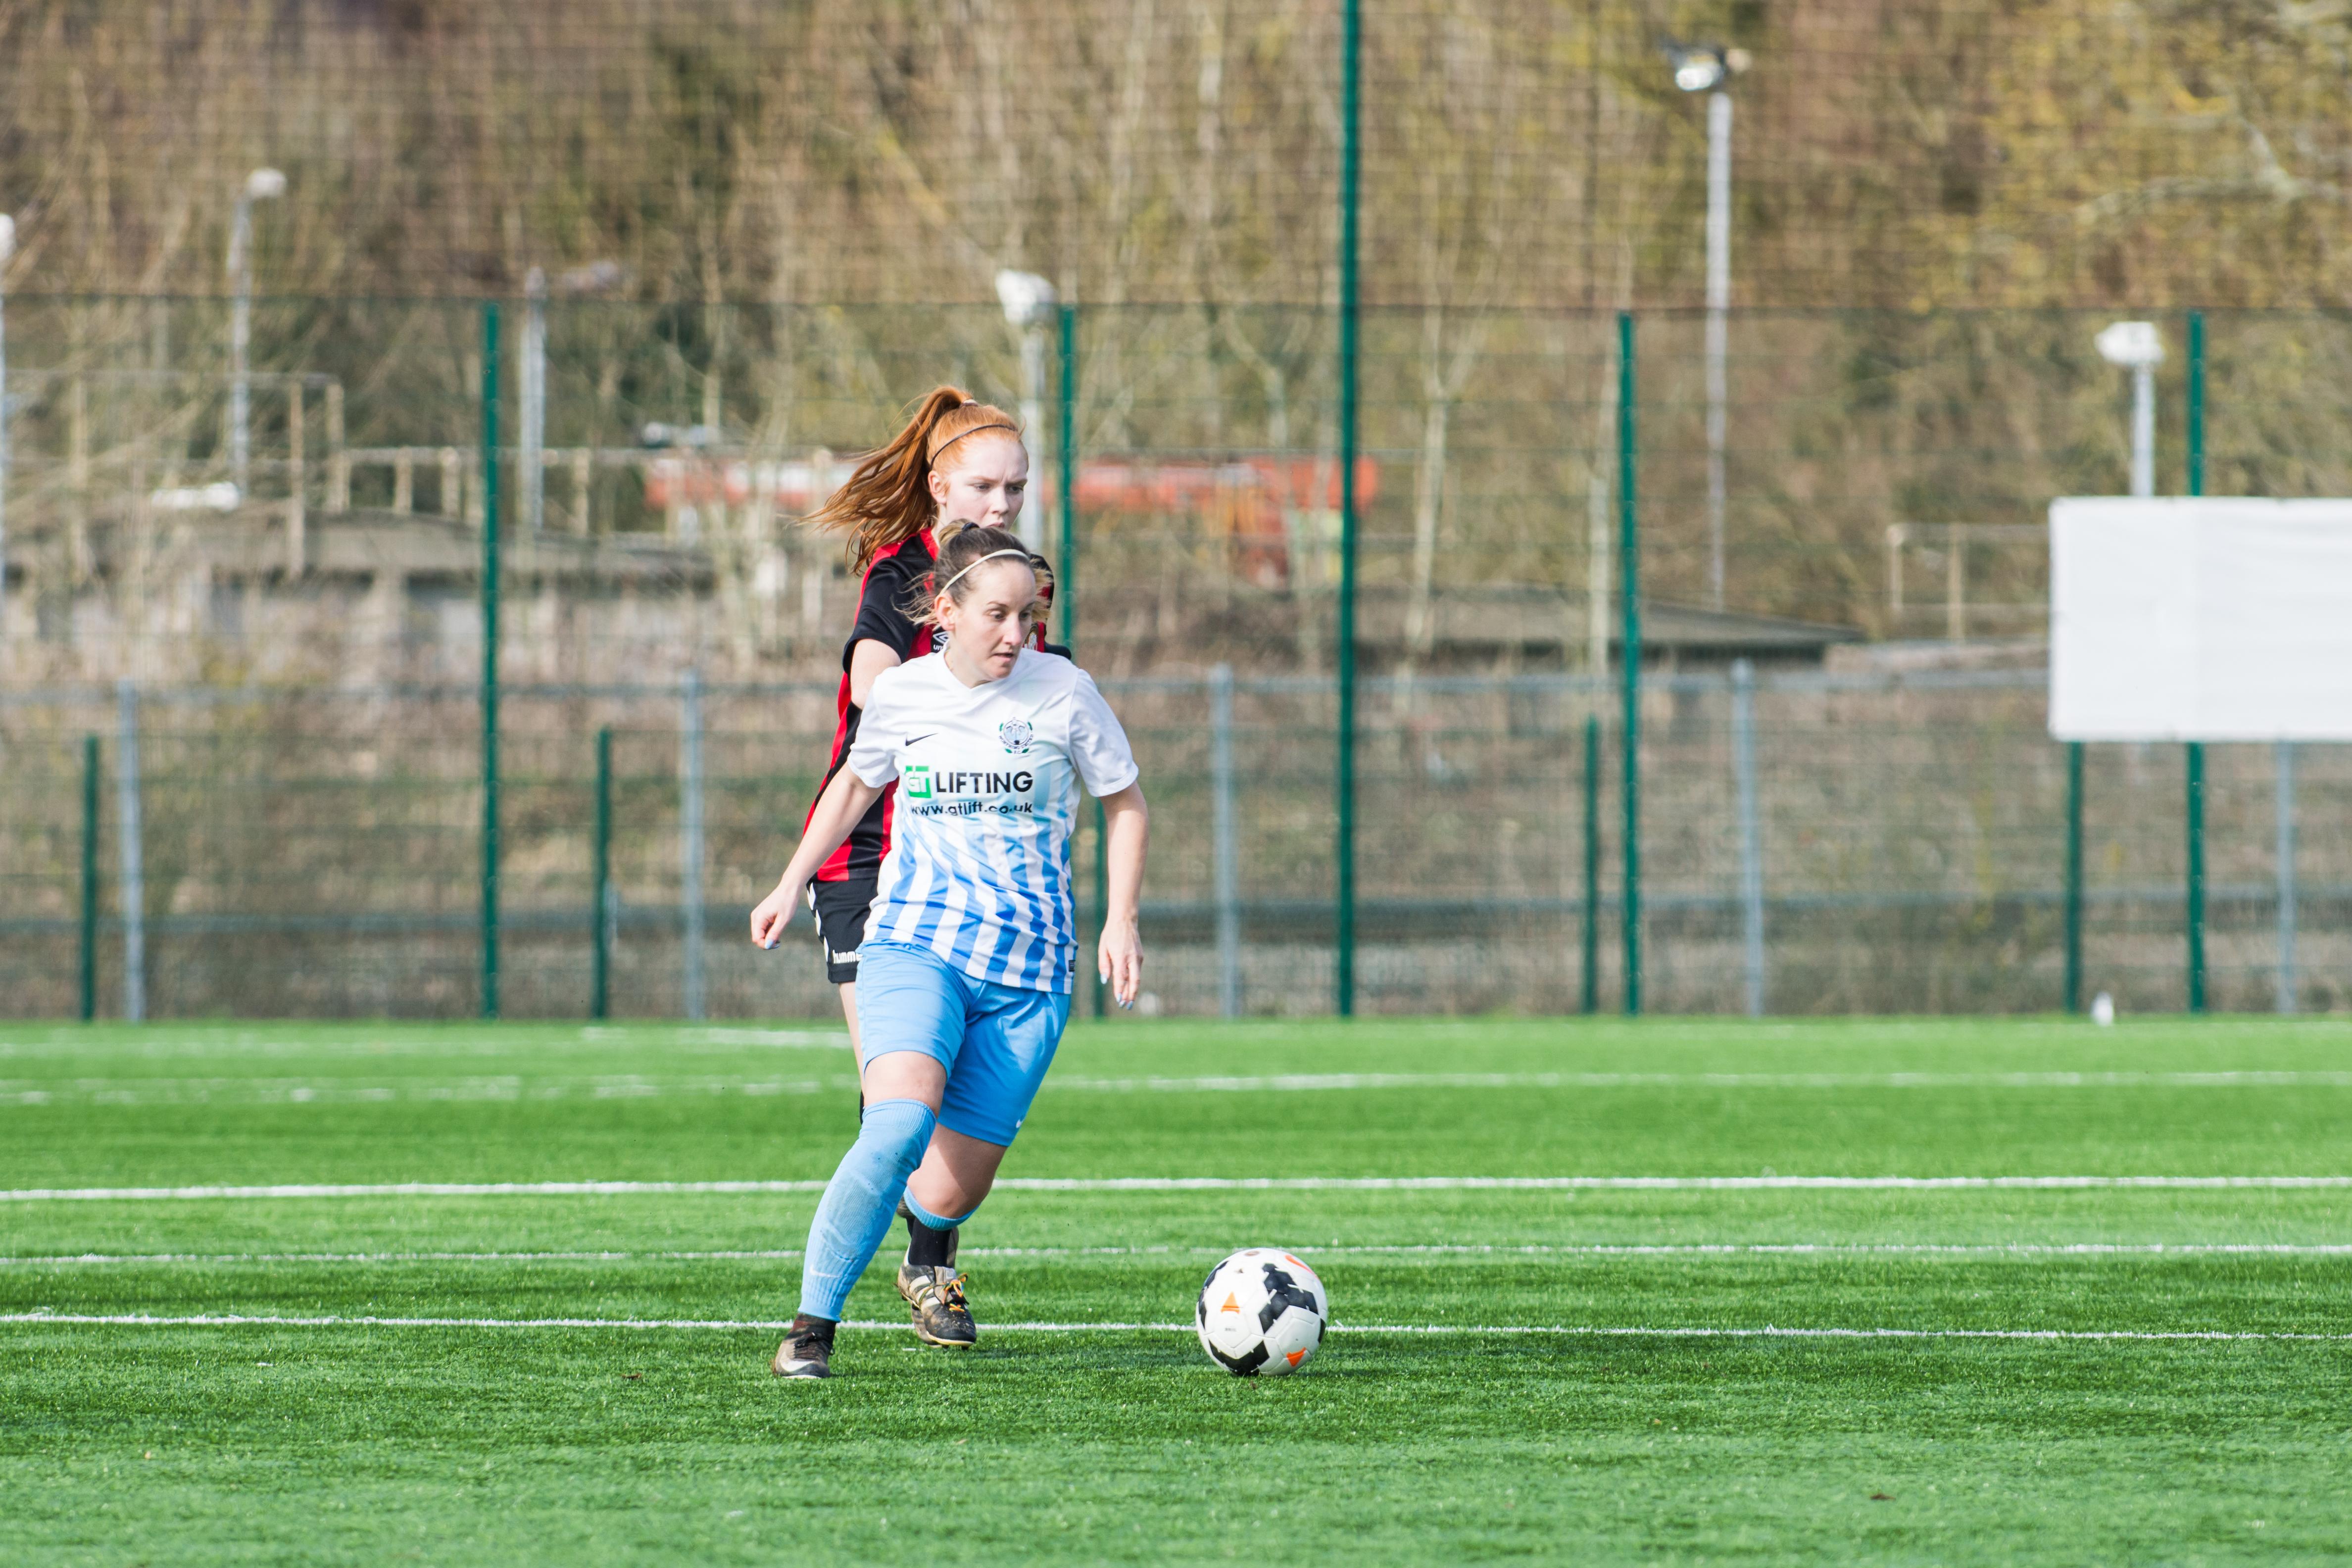 DAVID_JEFFERY Saltdean Utd Ladies FC vs Worthing Utd Ladies FC 11.03.18 07